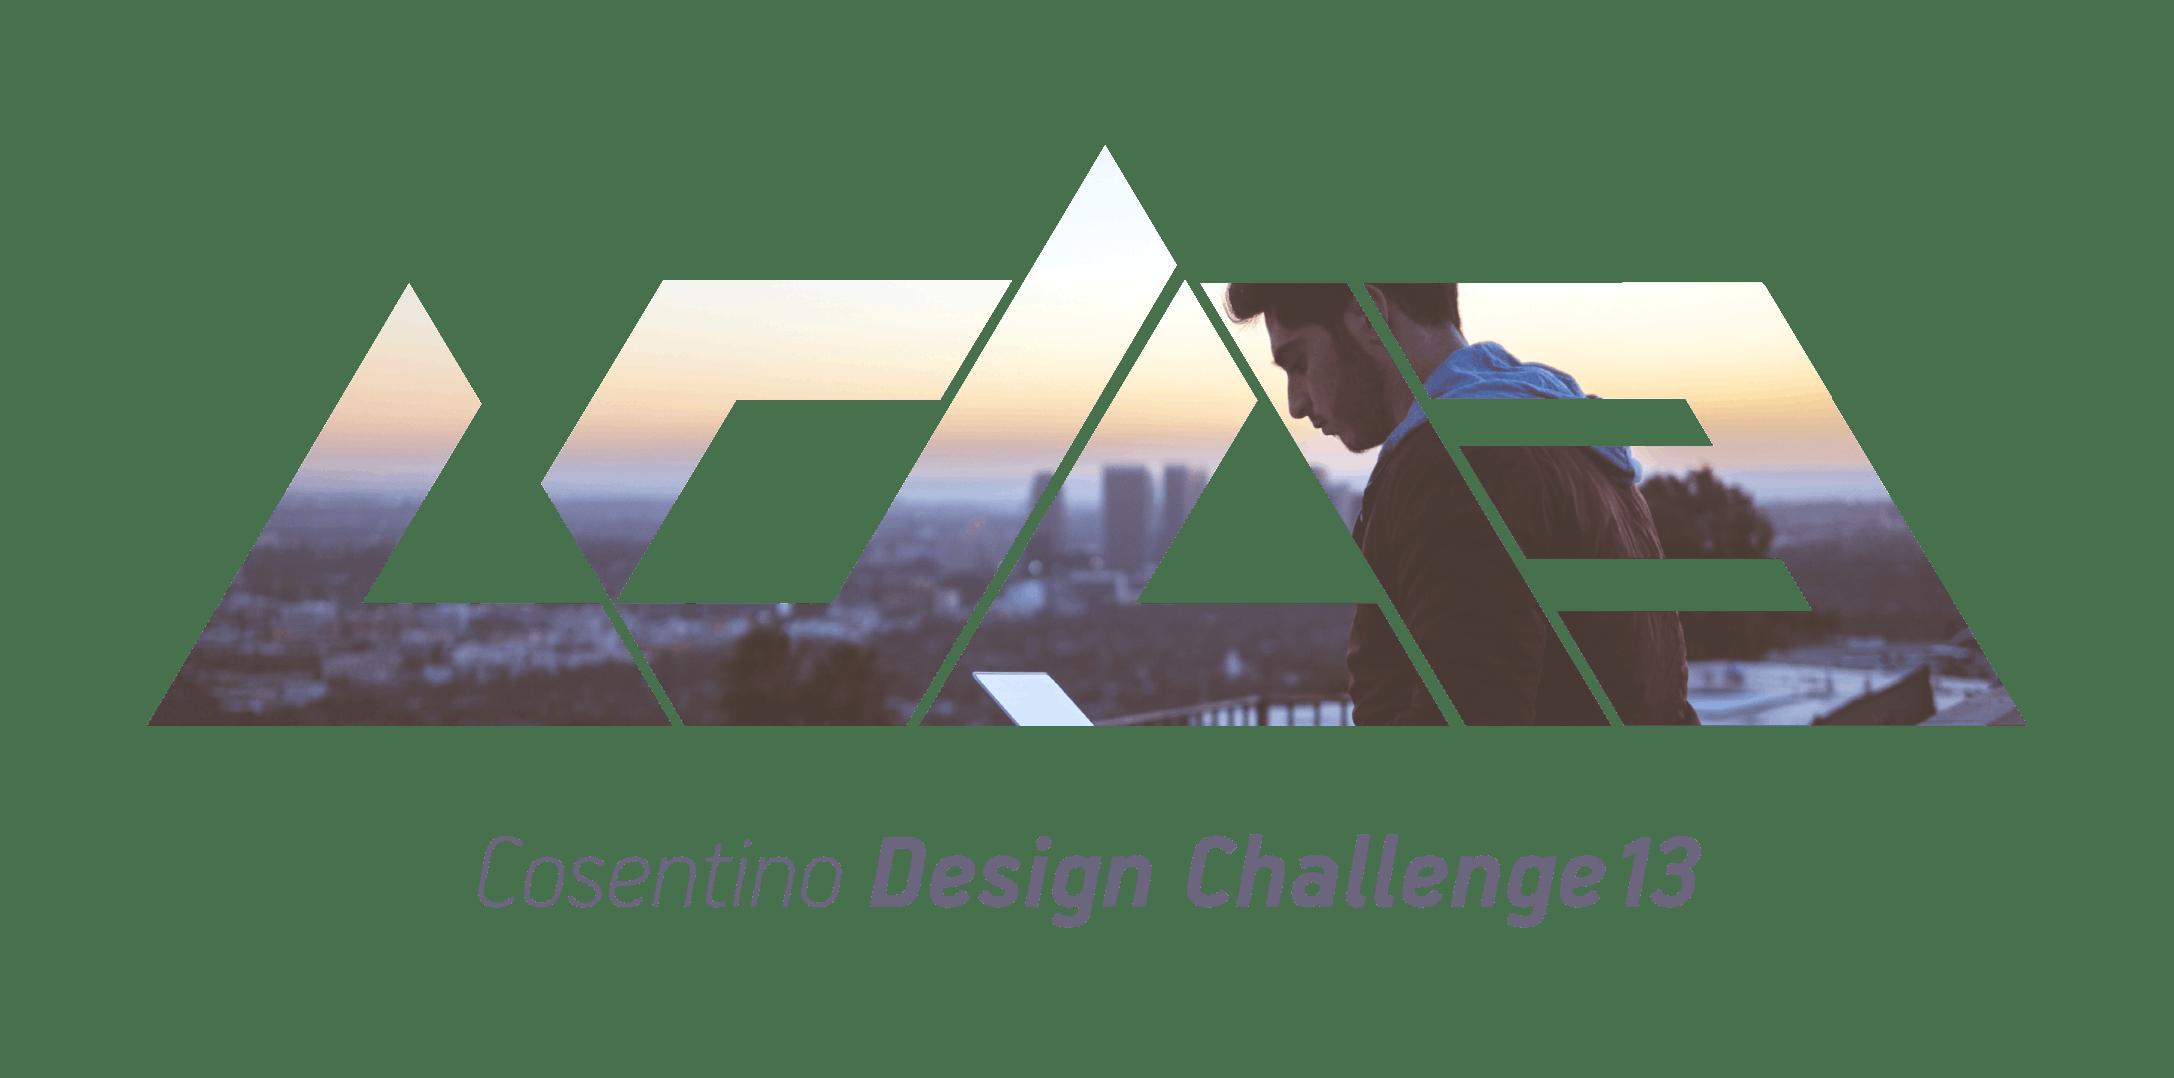 Image of logocd13 imagen 2 in Cosentino Design Challenge 13 - Cosentino